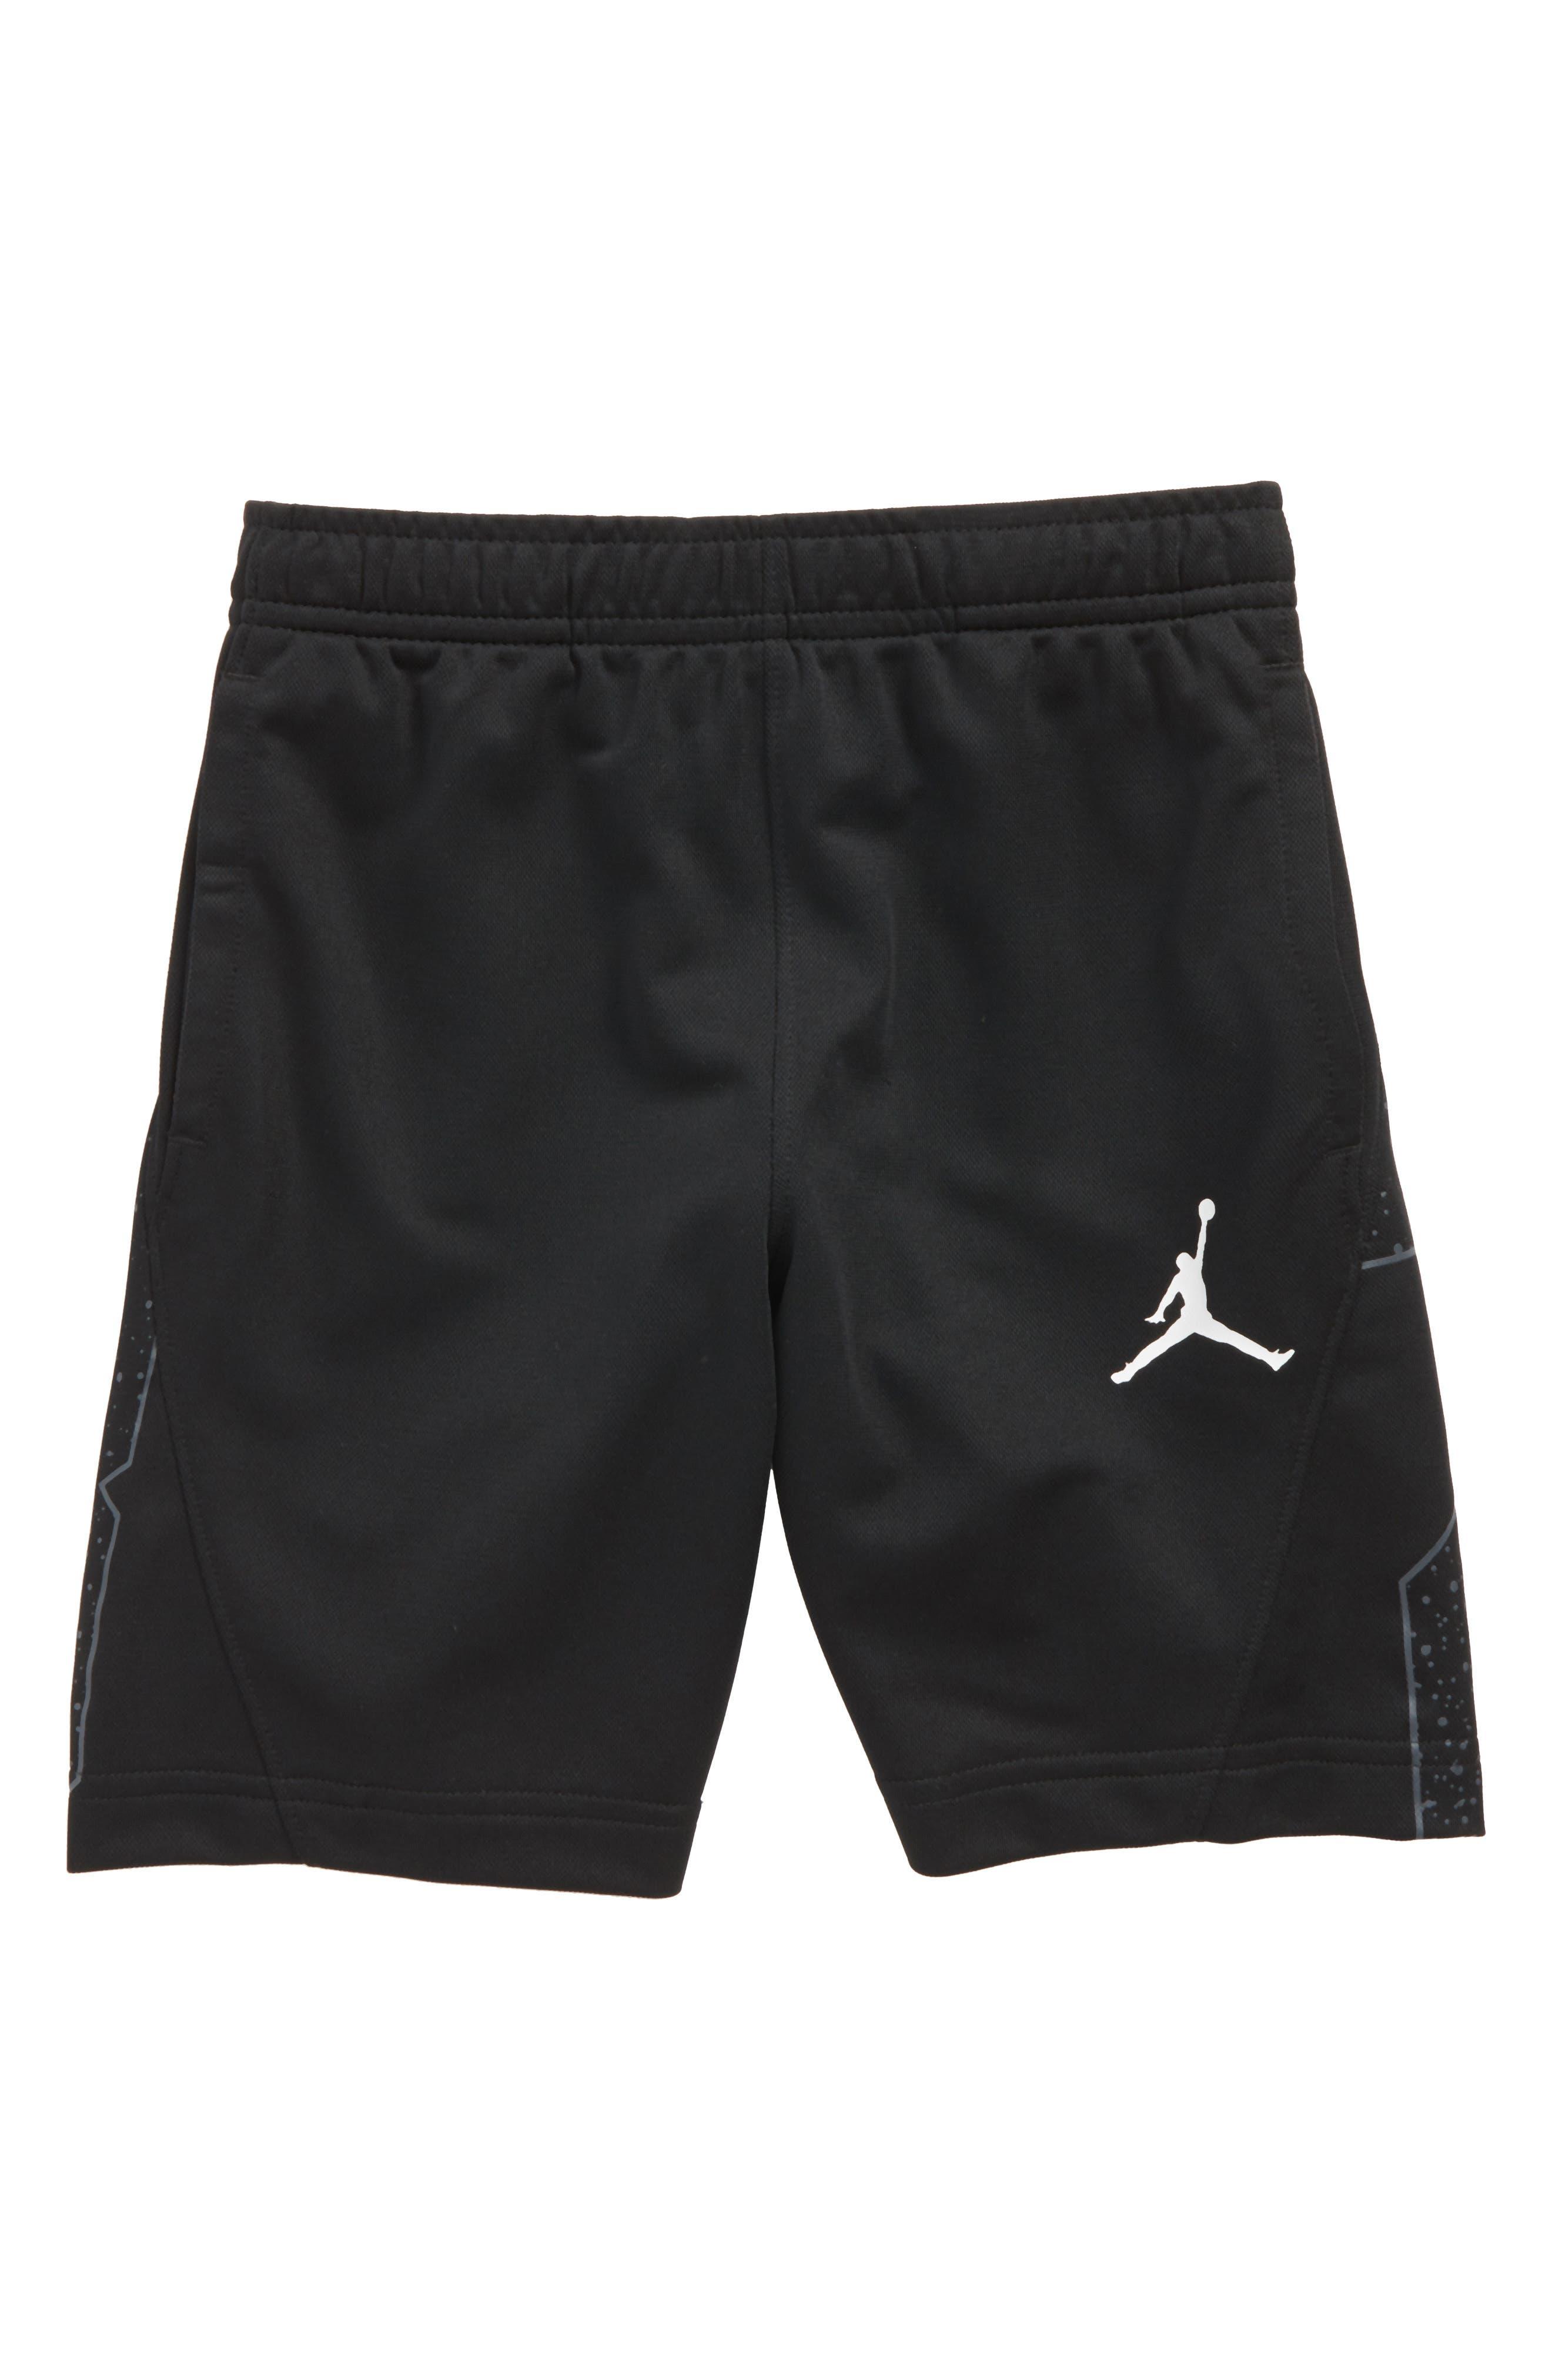 Main Image - Jordan Dry Speckle 23 Training Shorts (Toddler Boys & Little Boys)